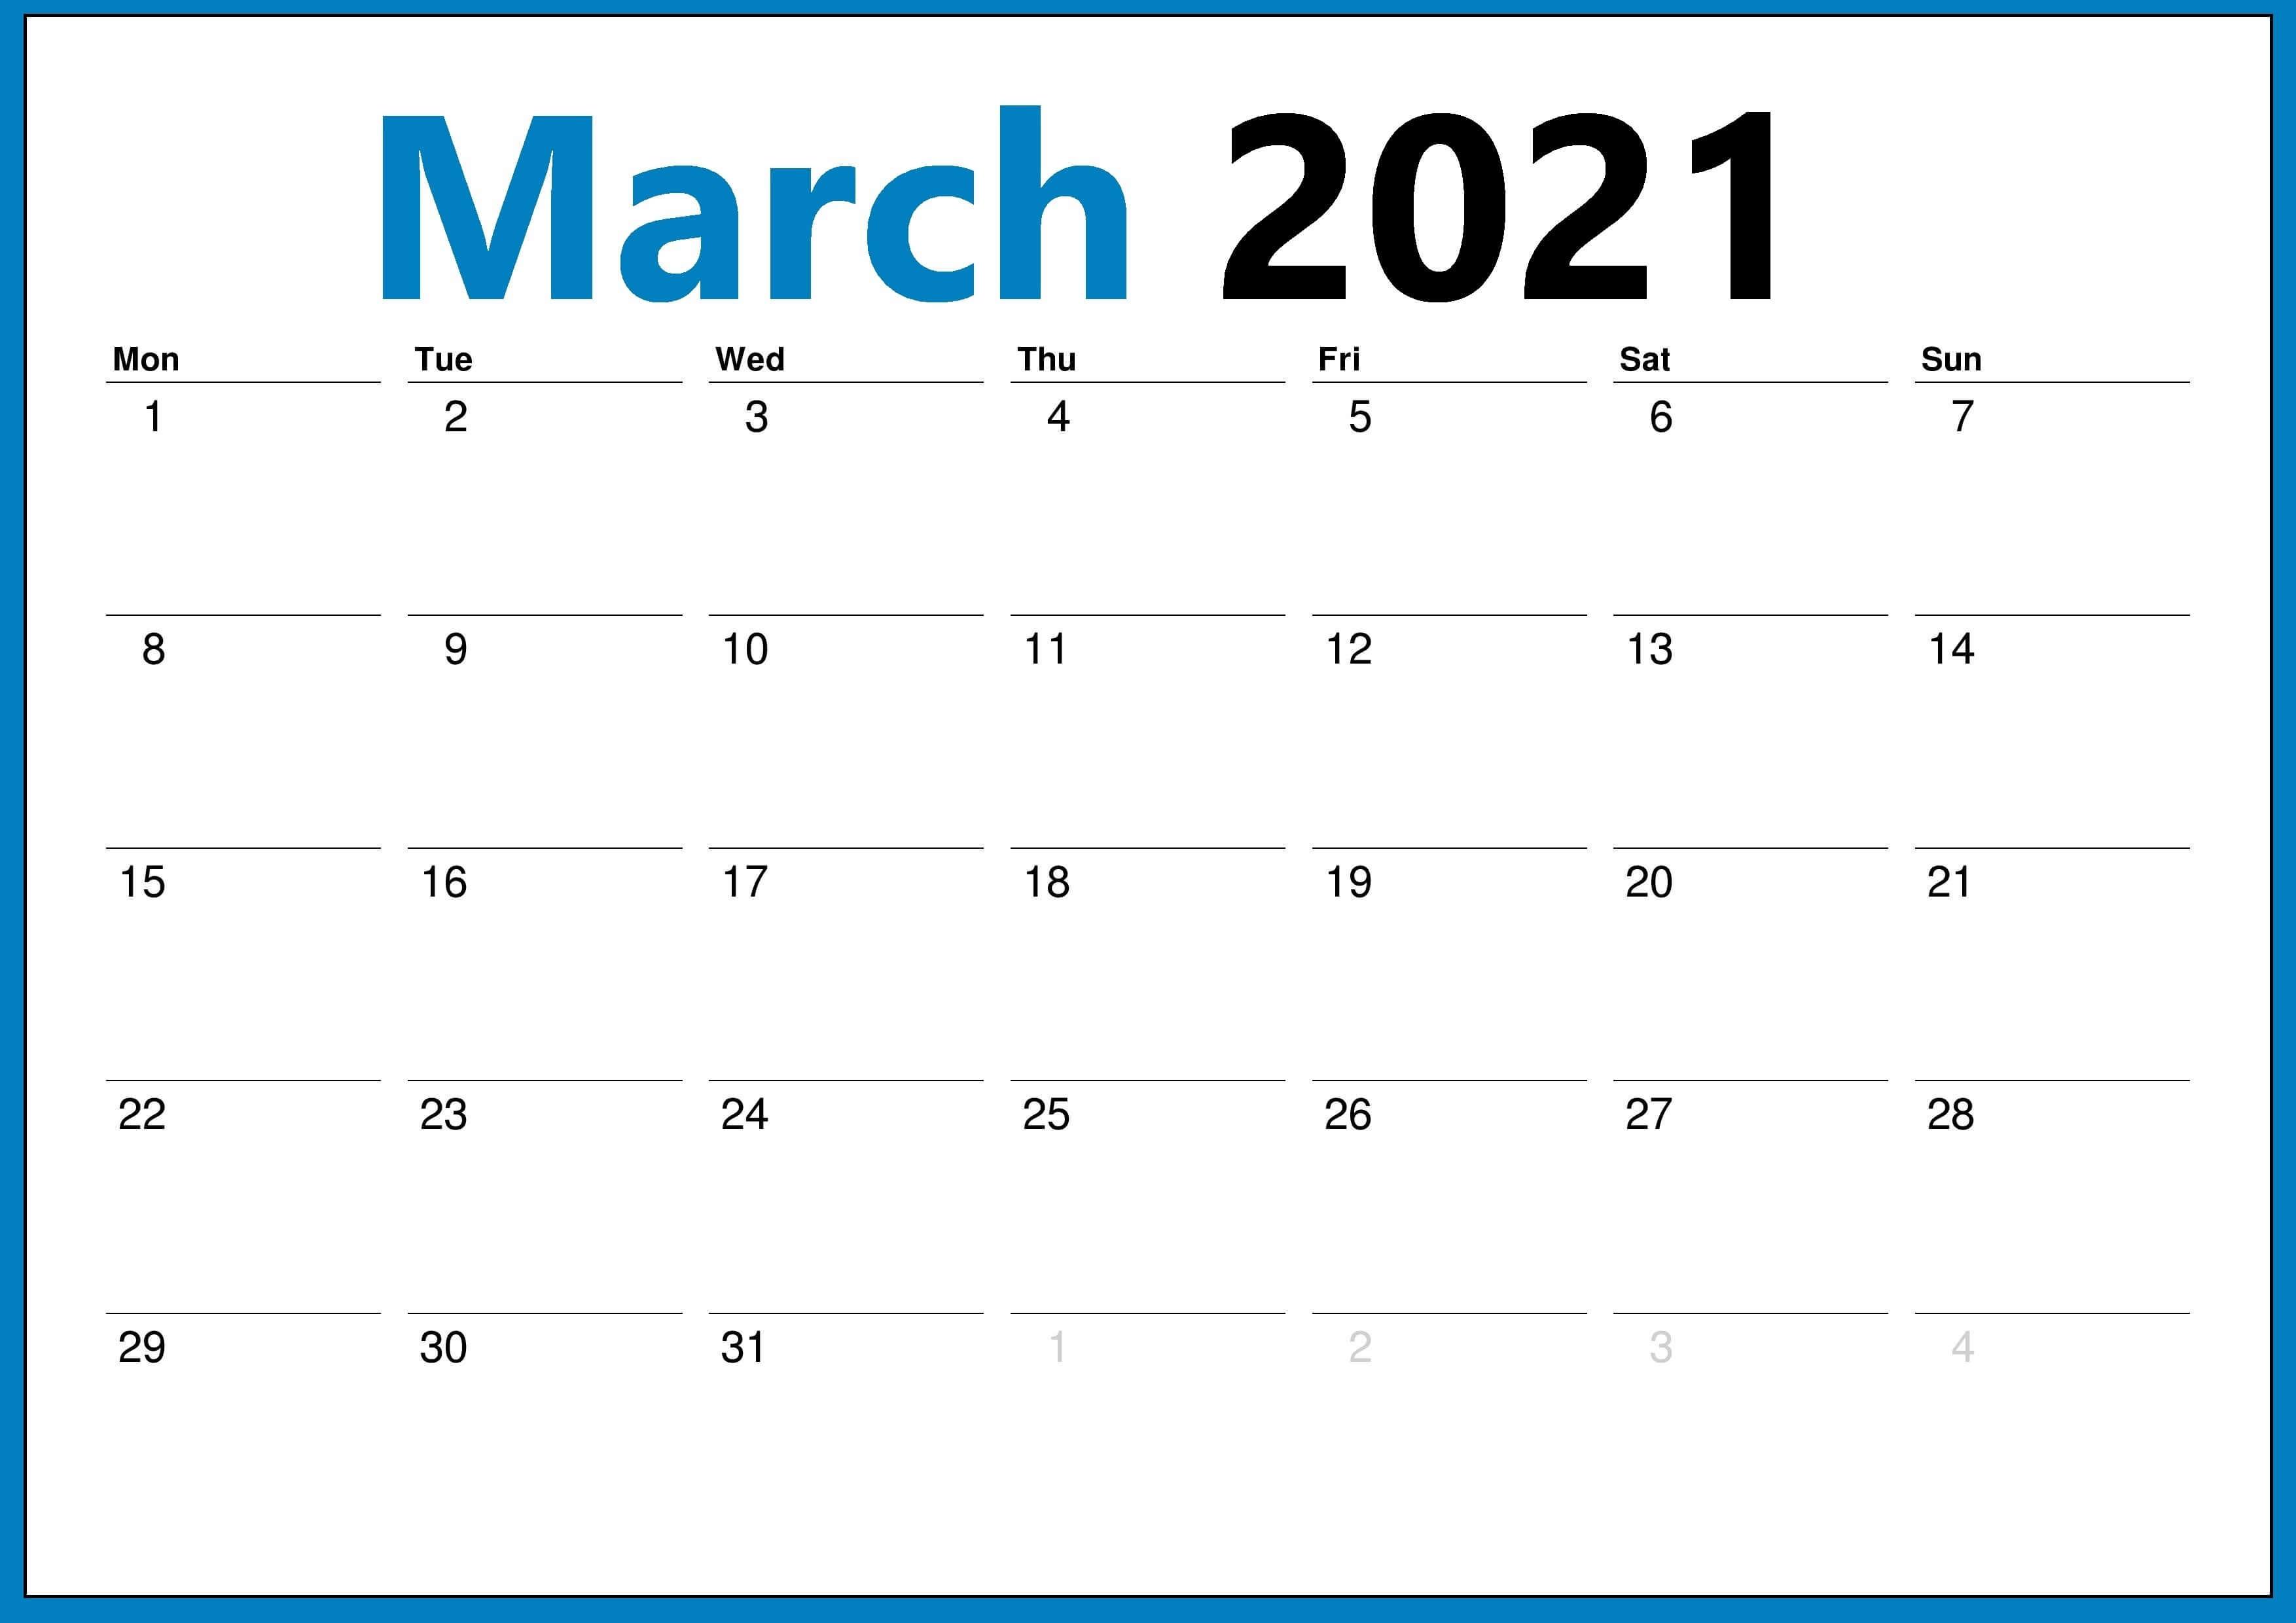 Fillable March 2021 Blank Calendar